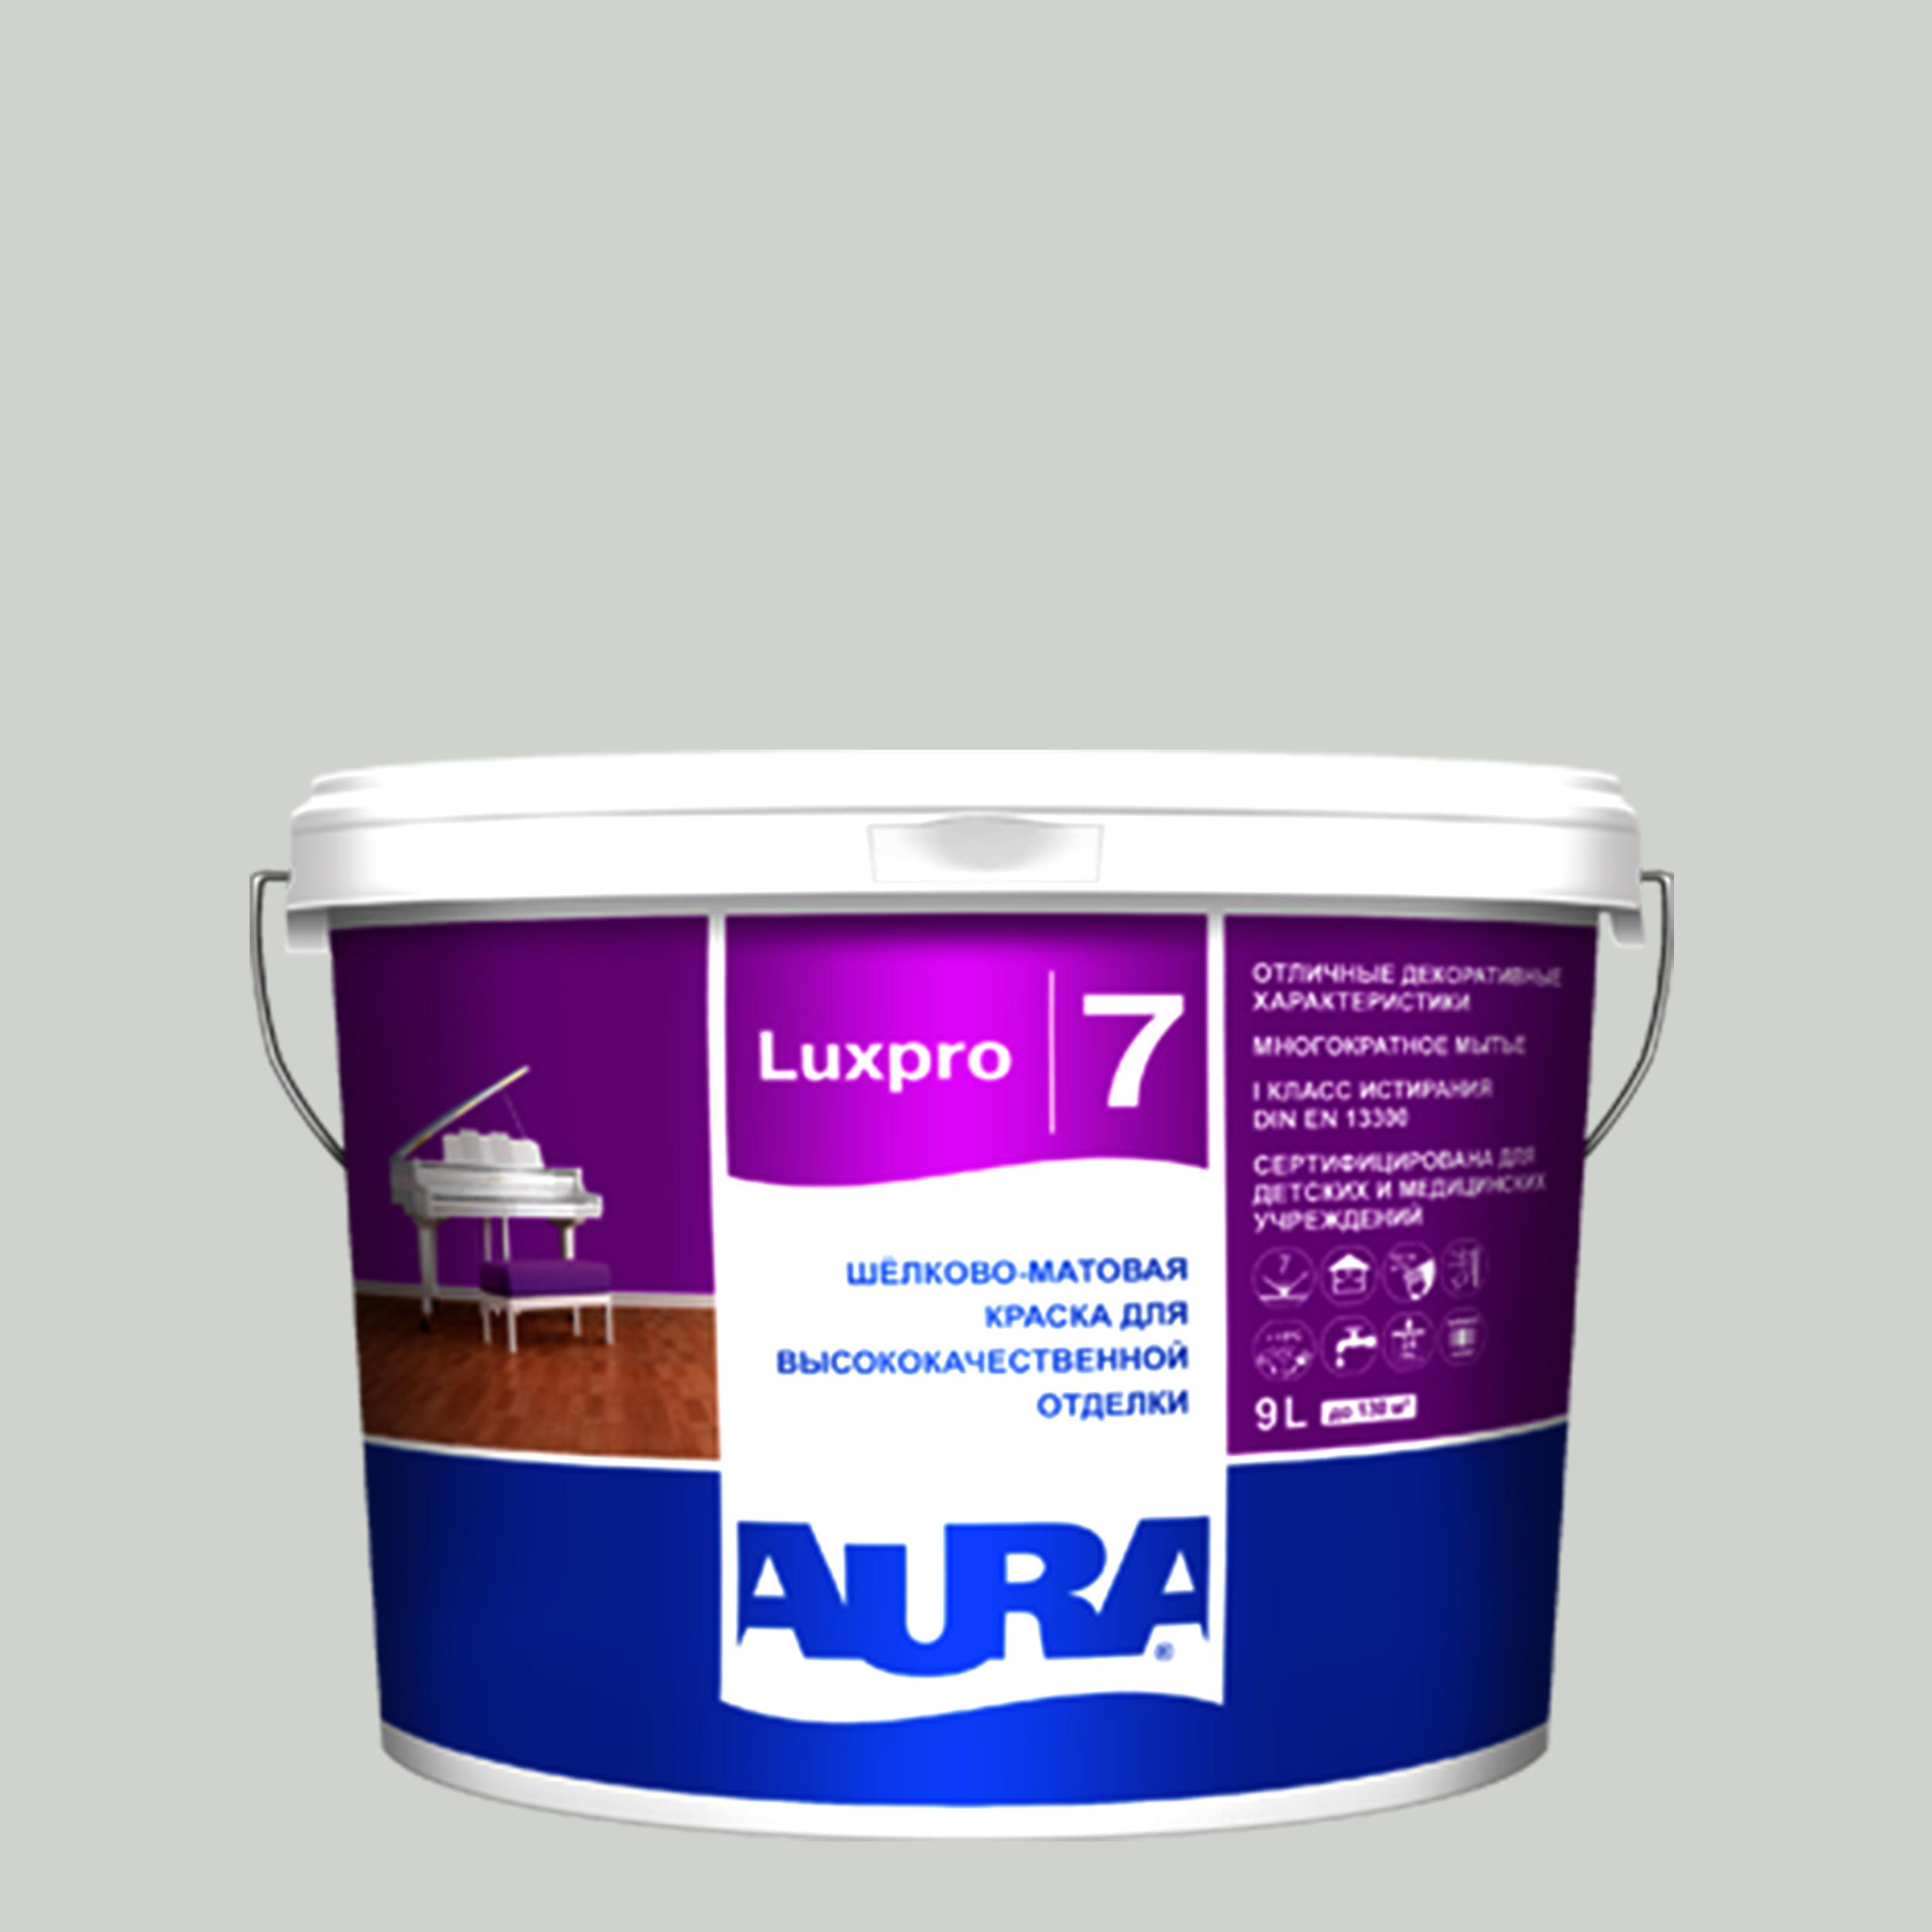 Фото 5 - Краска интерьерная, Aura LuxPRO 7, RAL 3027, 11 кг.